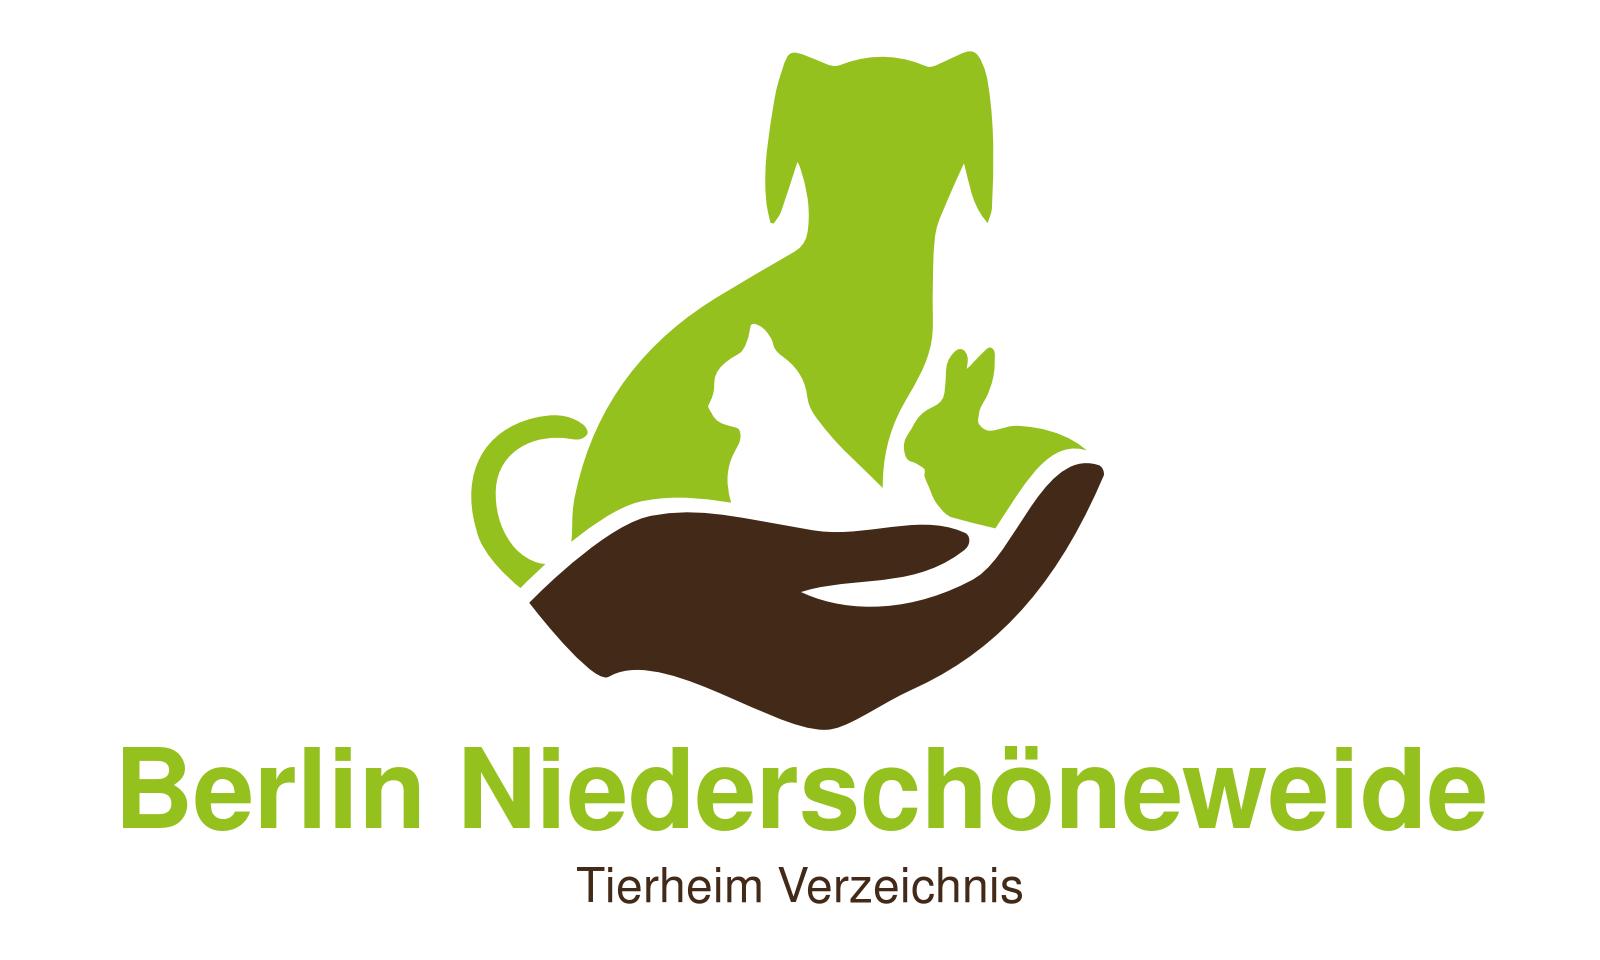 Tierheim Berlin Niederschöneweide